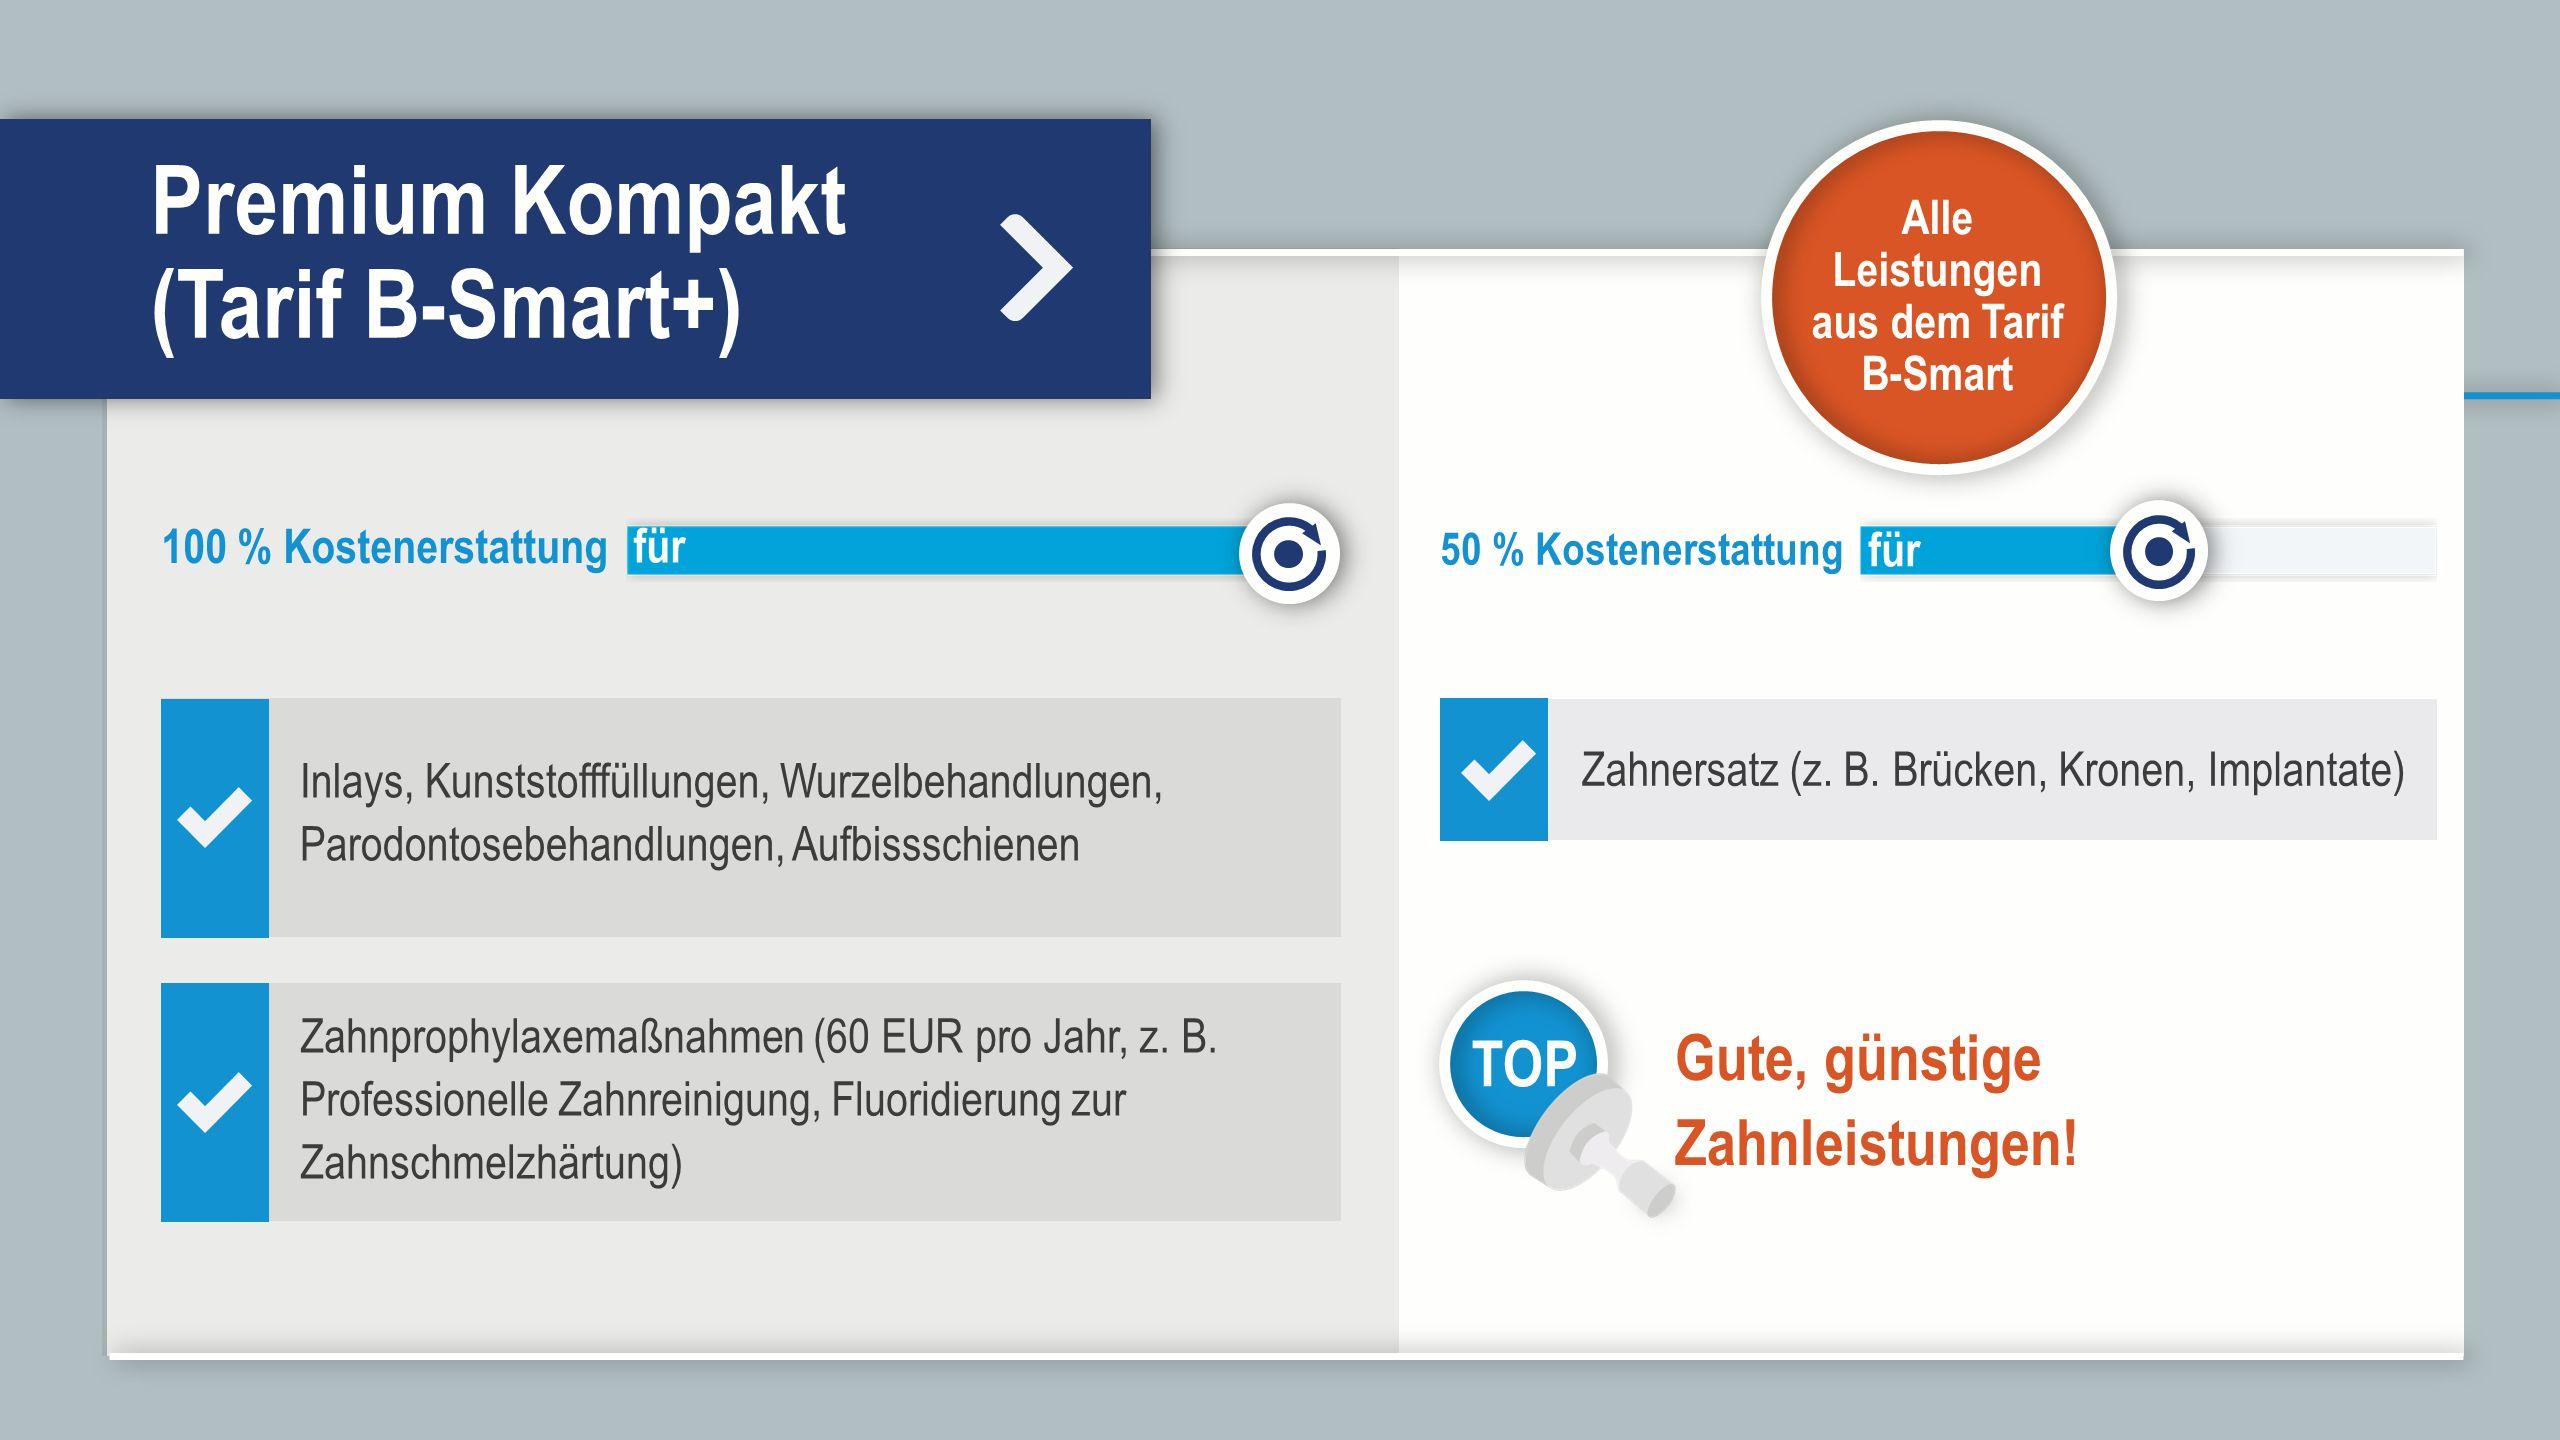 Premium Kompakt (Tarif B-Smart+) 100 % Kostenerstattung für 50 % Kostenerstattung für Alle Leistungen aus dem Tarif B-Smart Zahnersatz (z.